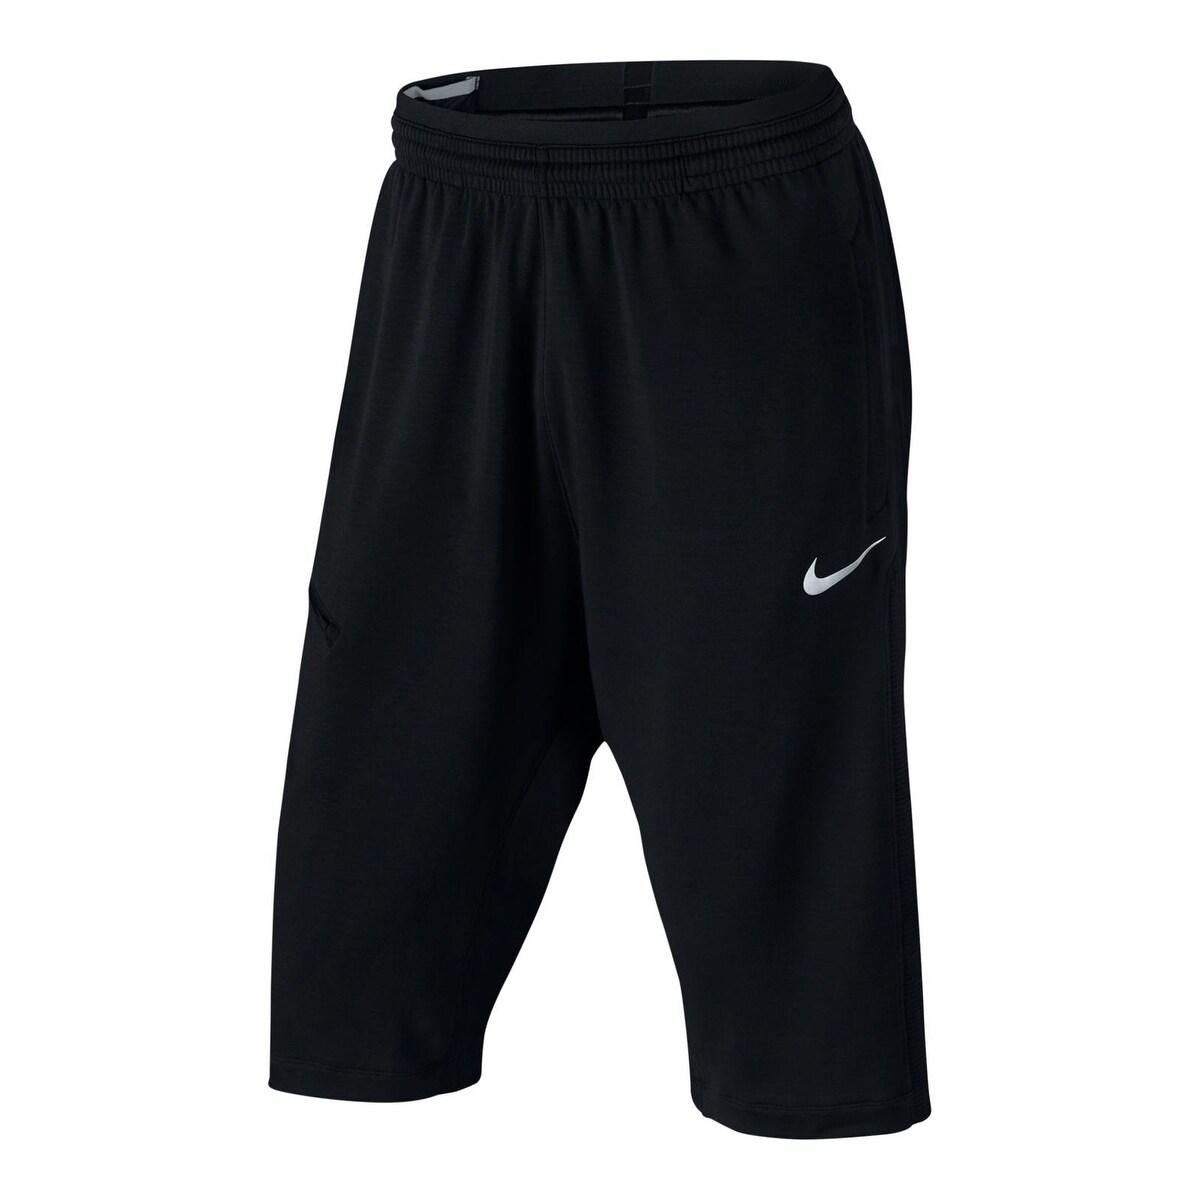 Nike Mens Dry Shorts Basketball Zip Pocket - M